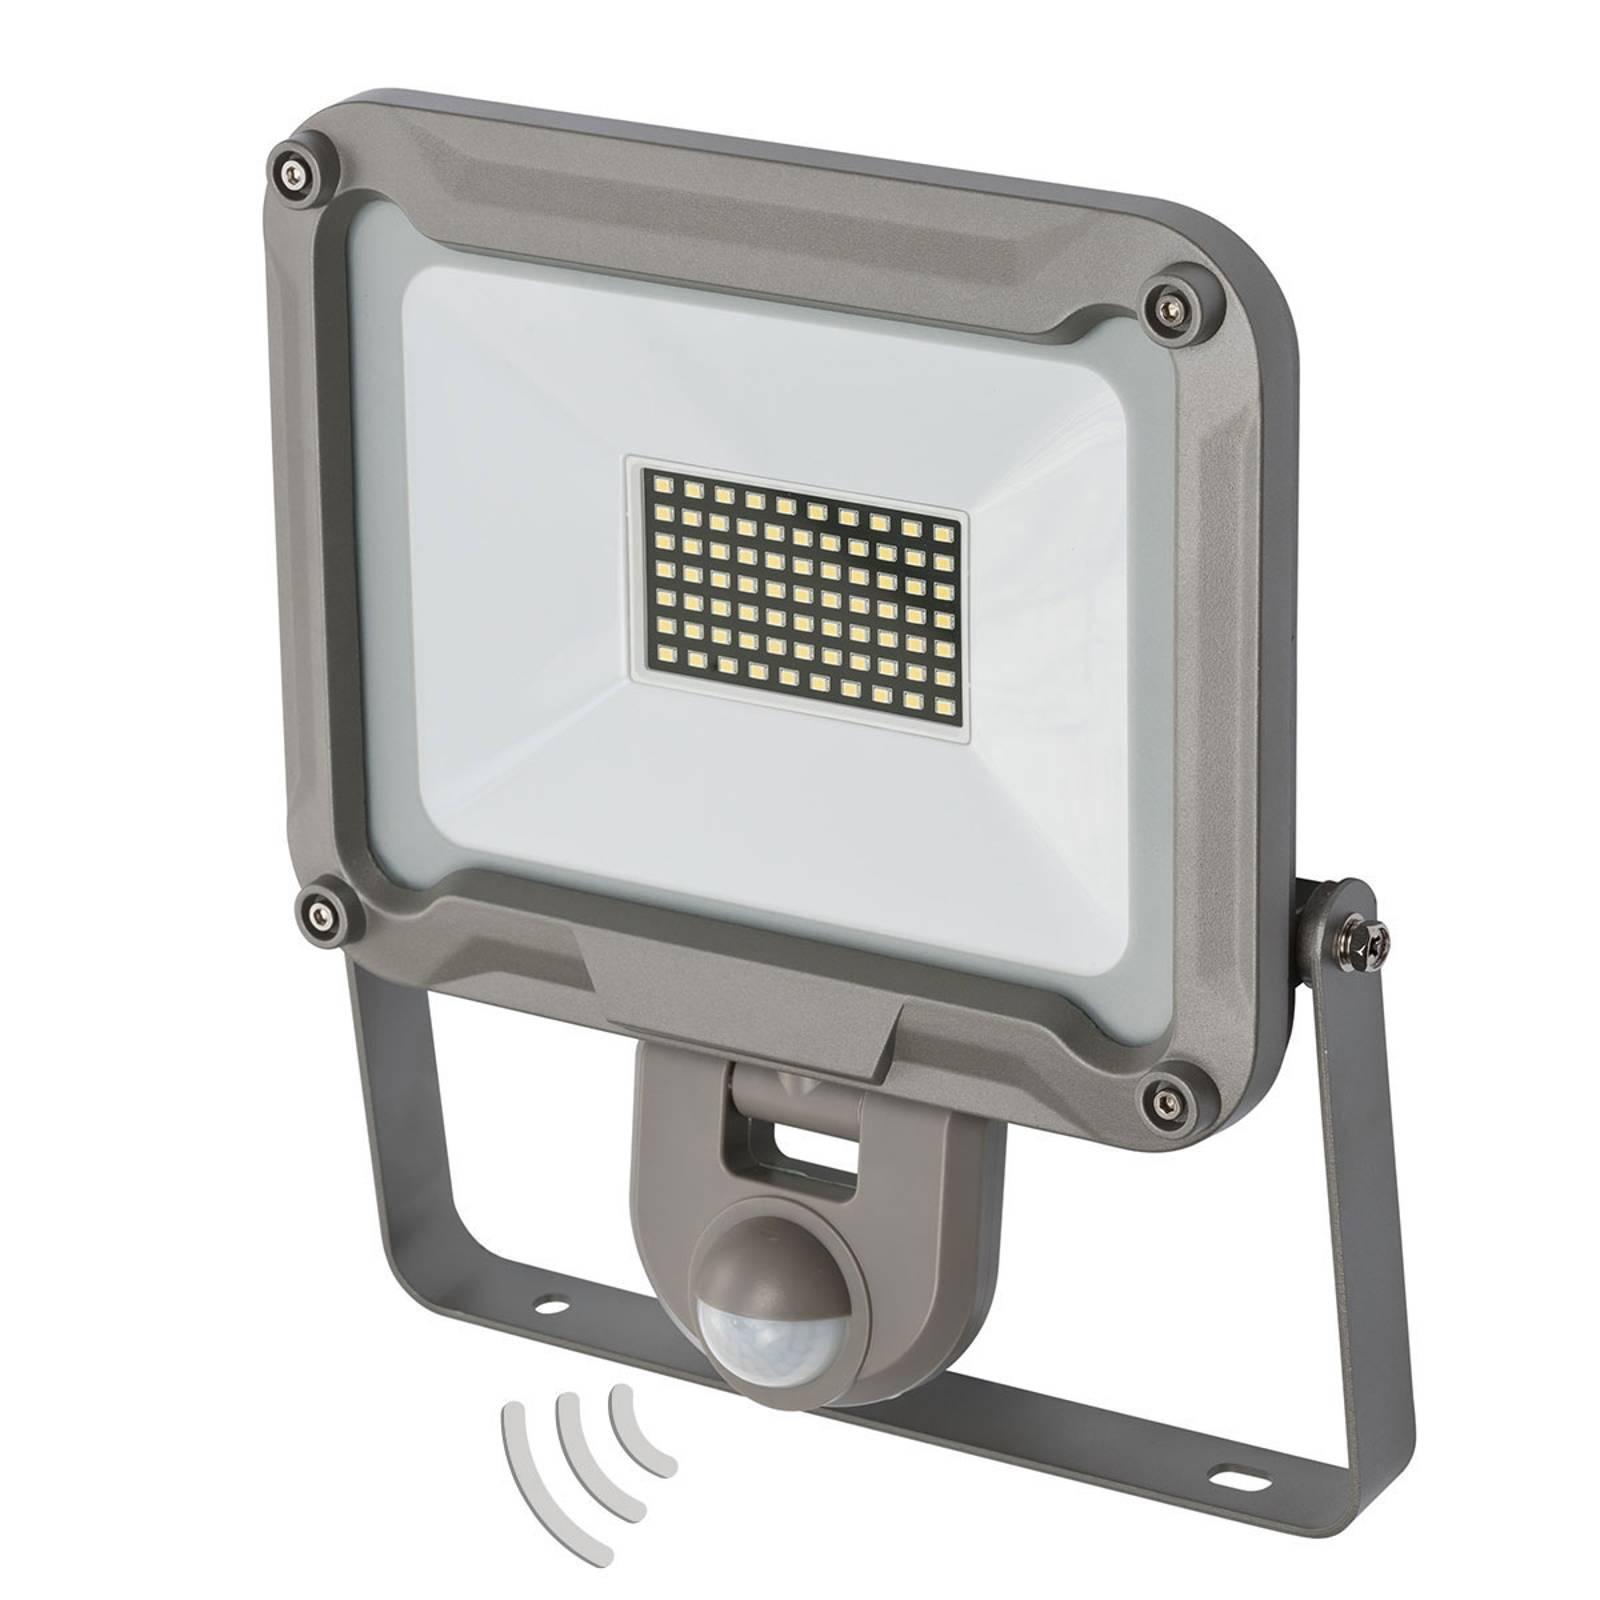 LED-ulkokohdevalaisin Jaro tunnistimella IP44 50W